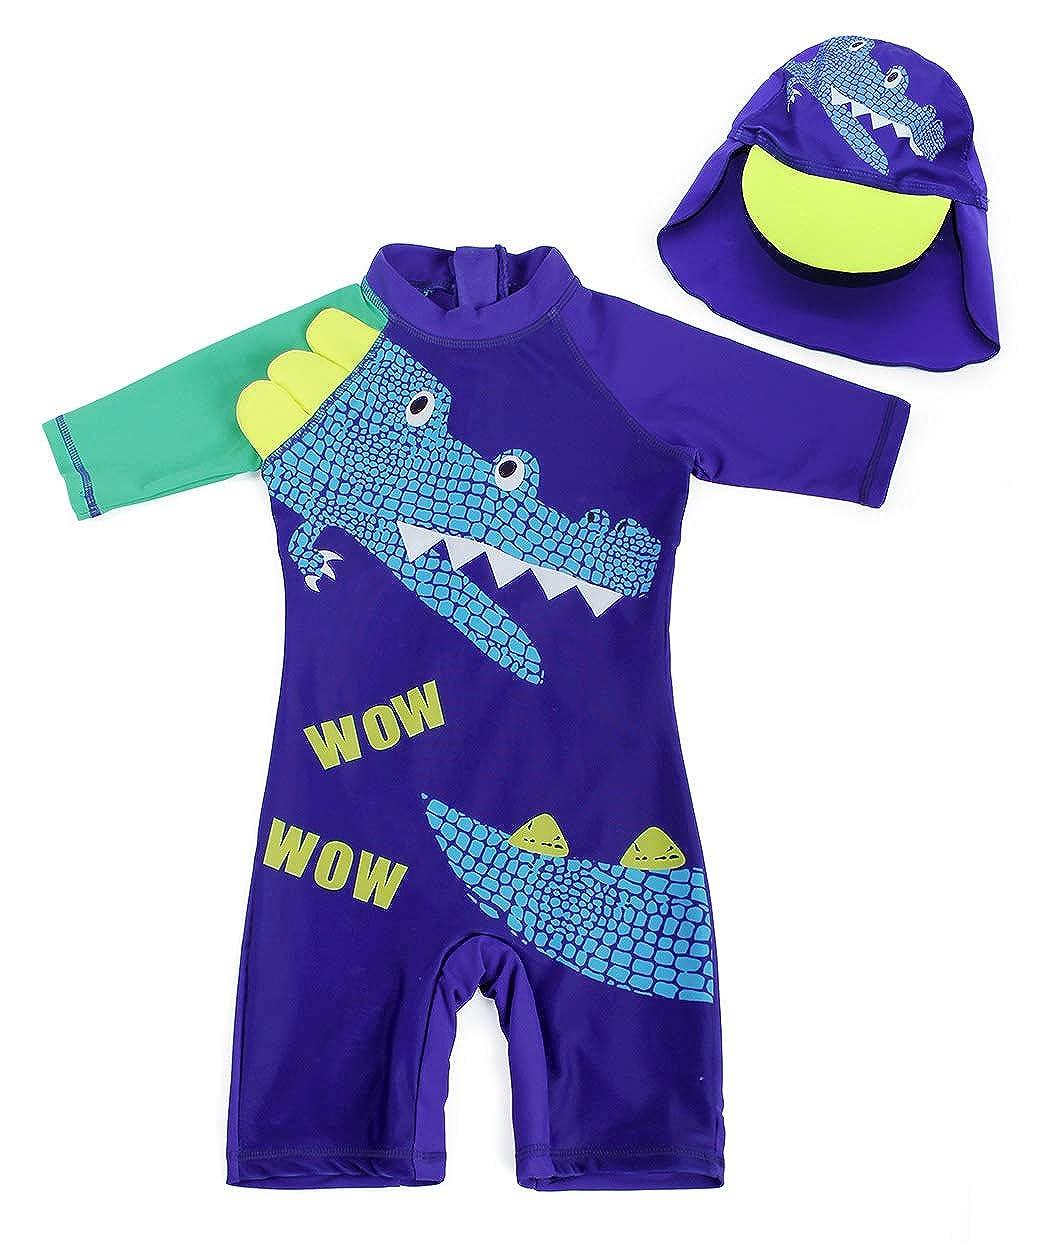 AmzBarley Boys Girl One Piece Swimsuit Swim Swimming Bathing Suit Swimwear Caps